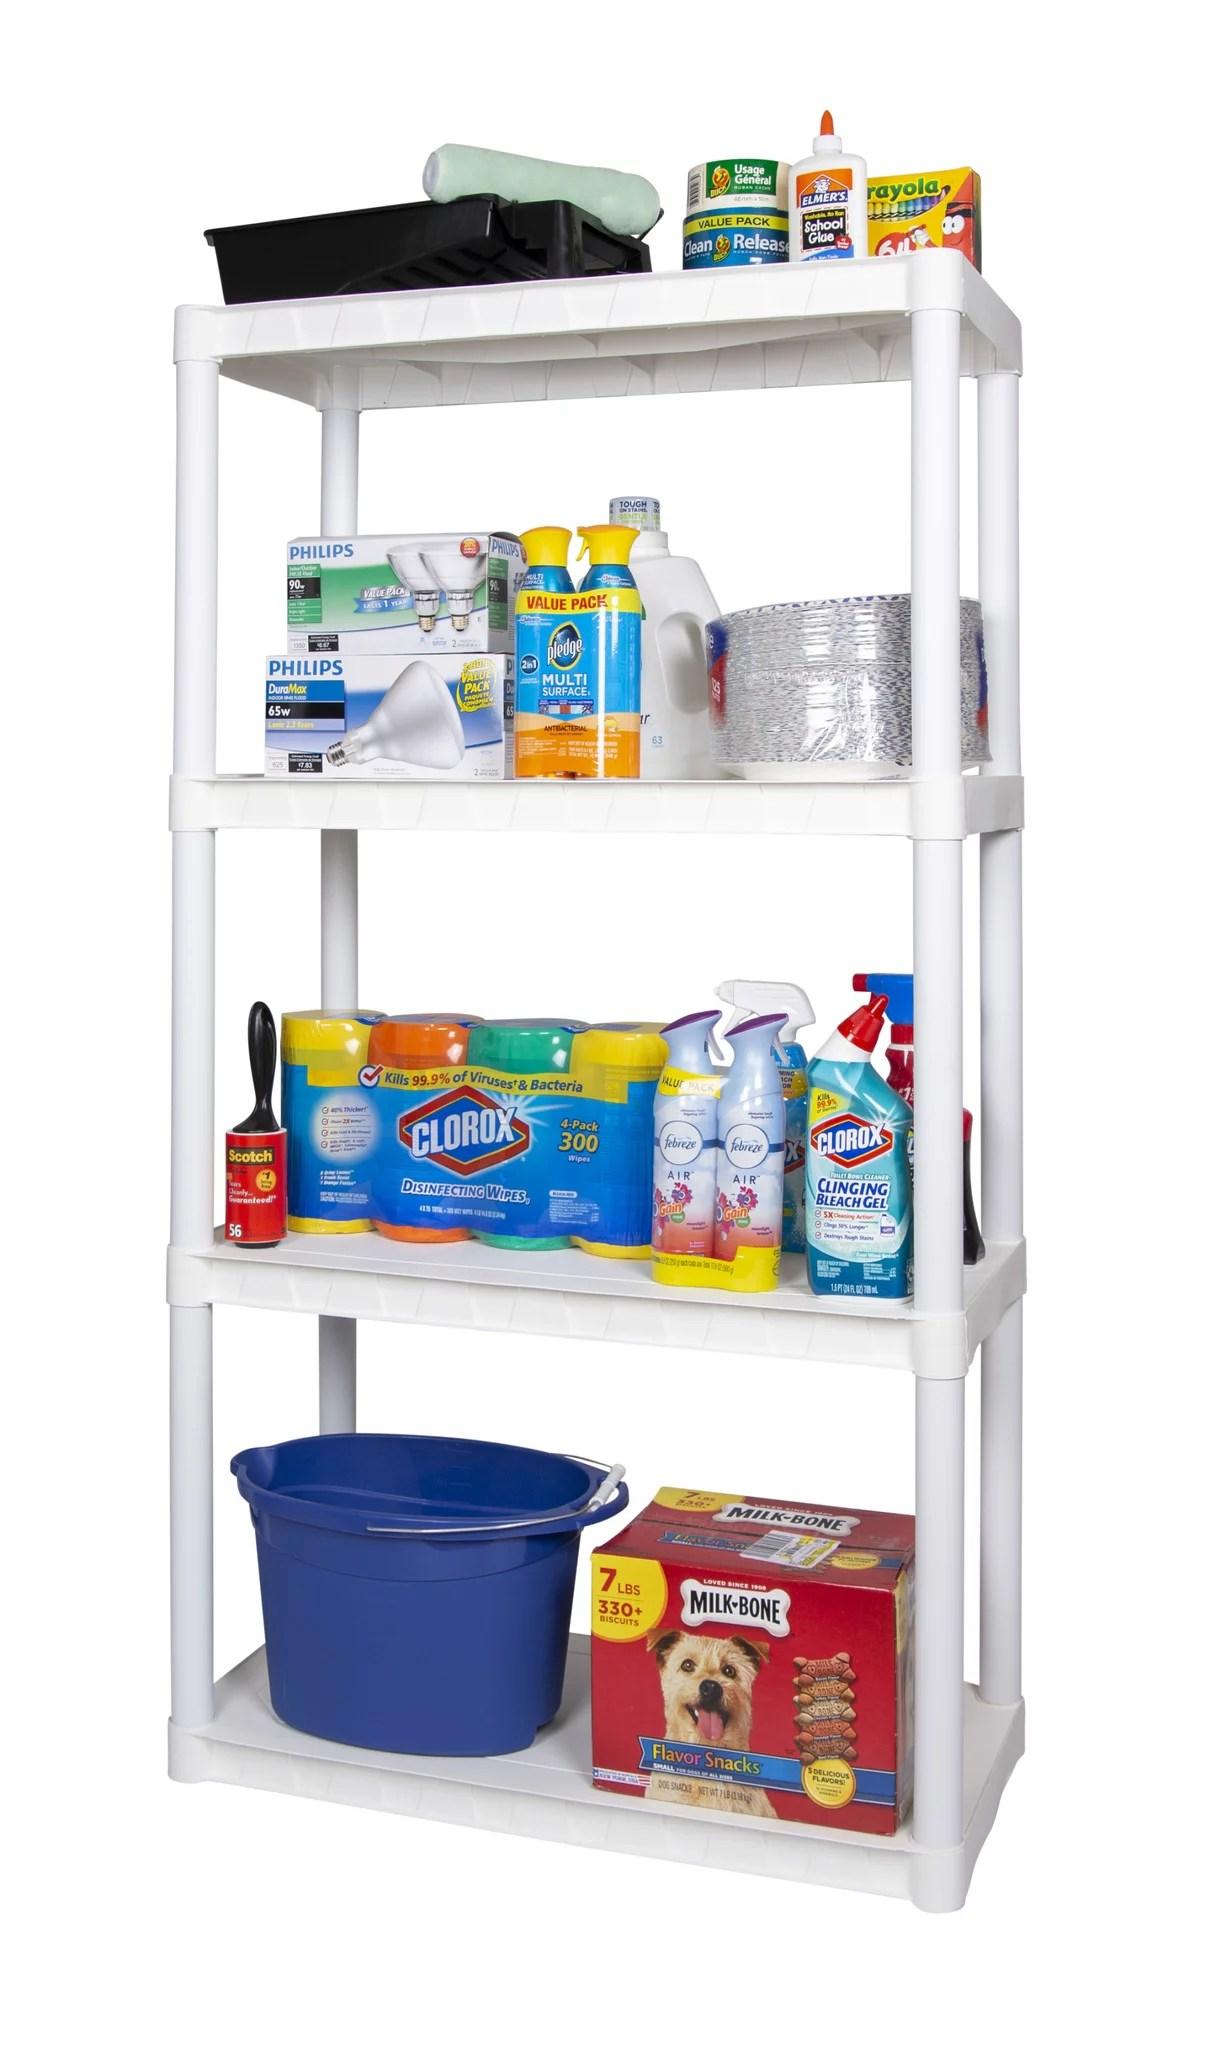 plano 30 w x 14 d x 55 5 h 4 shelf solid plastic shelf unit white 280 lb capacity walmart com